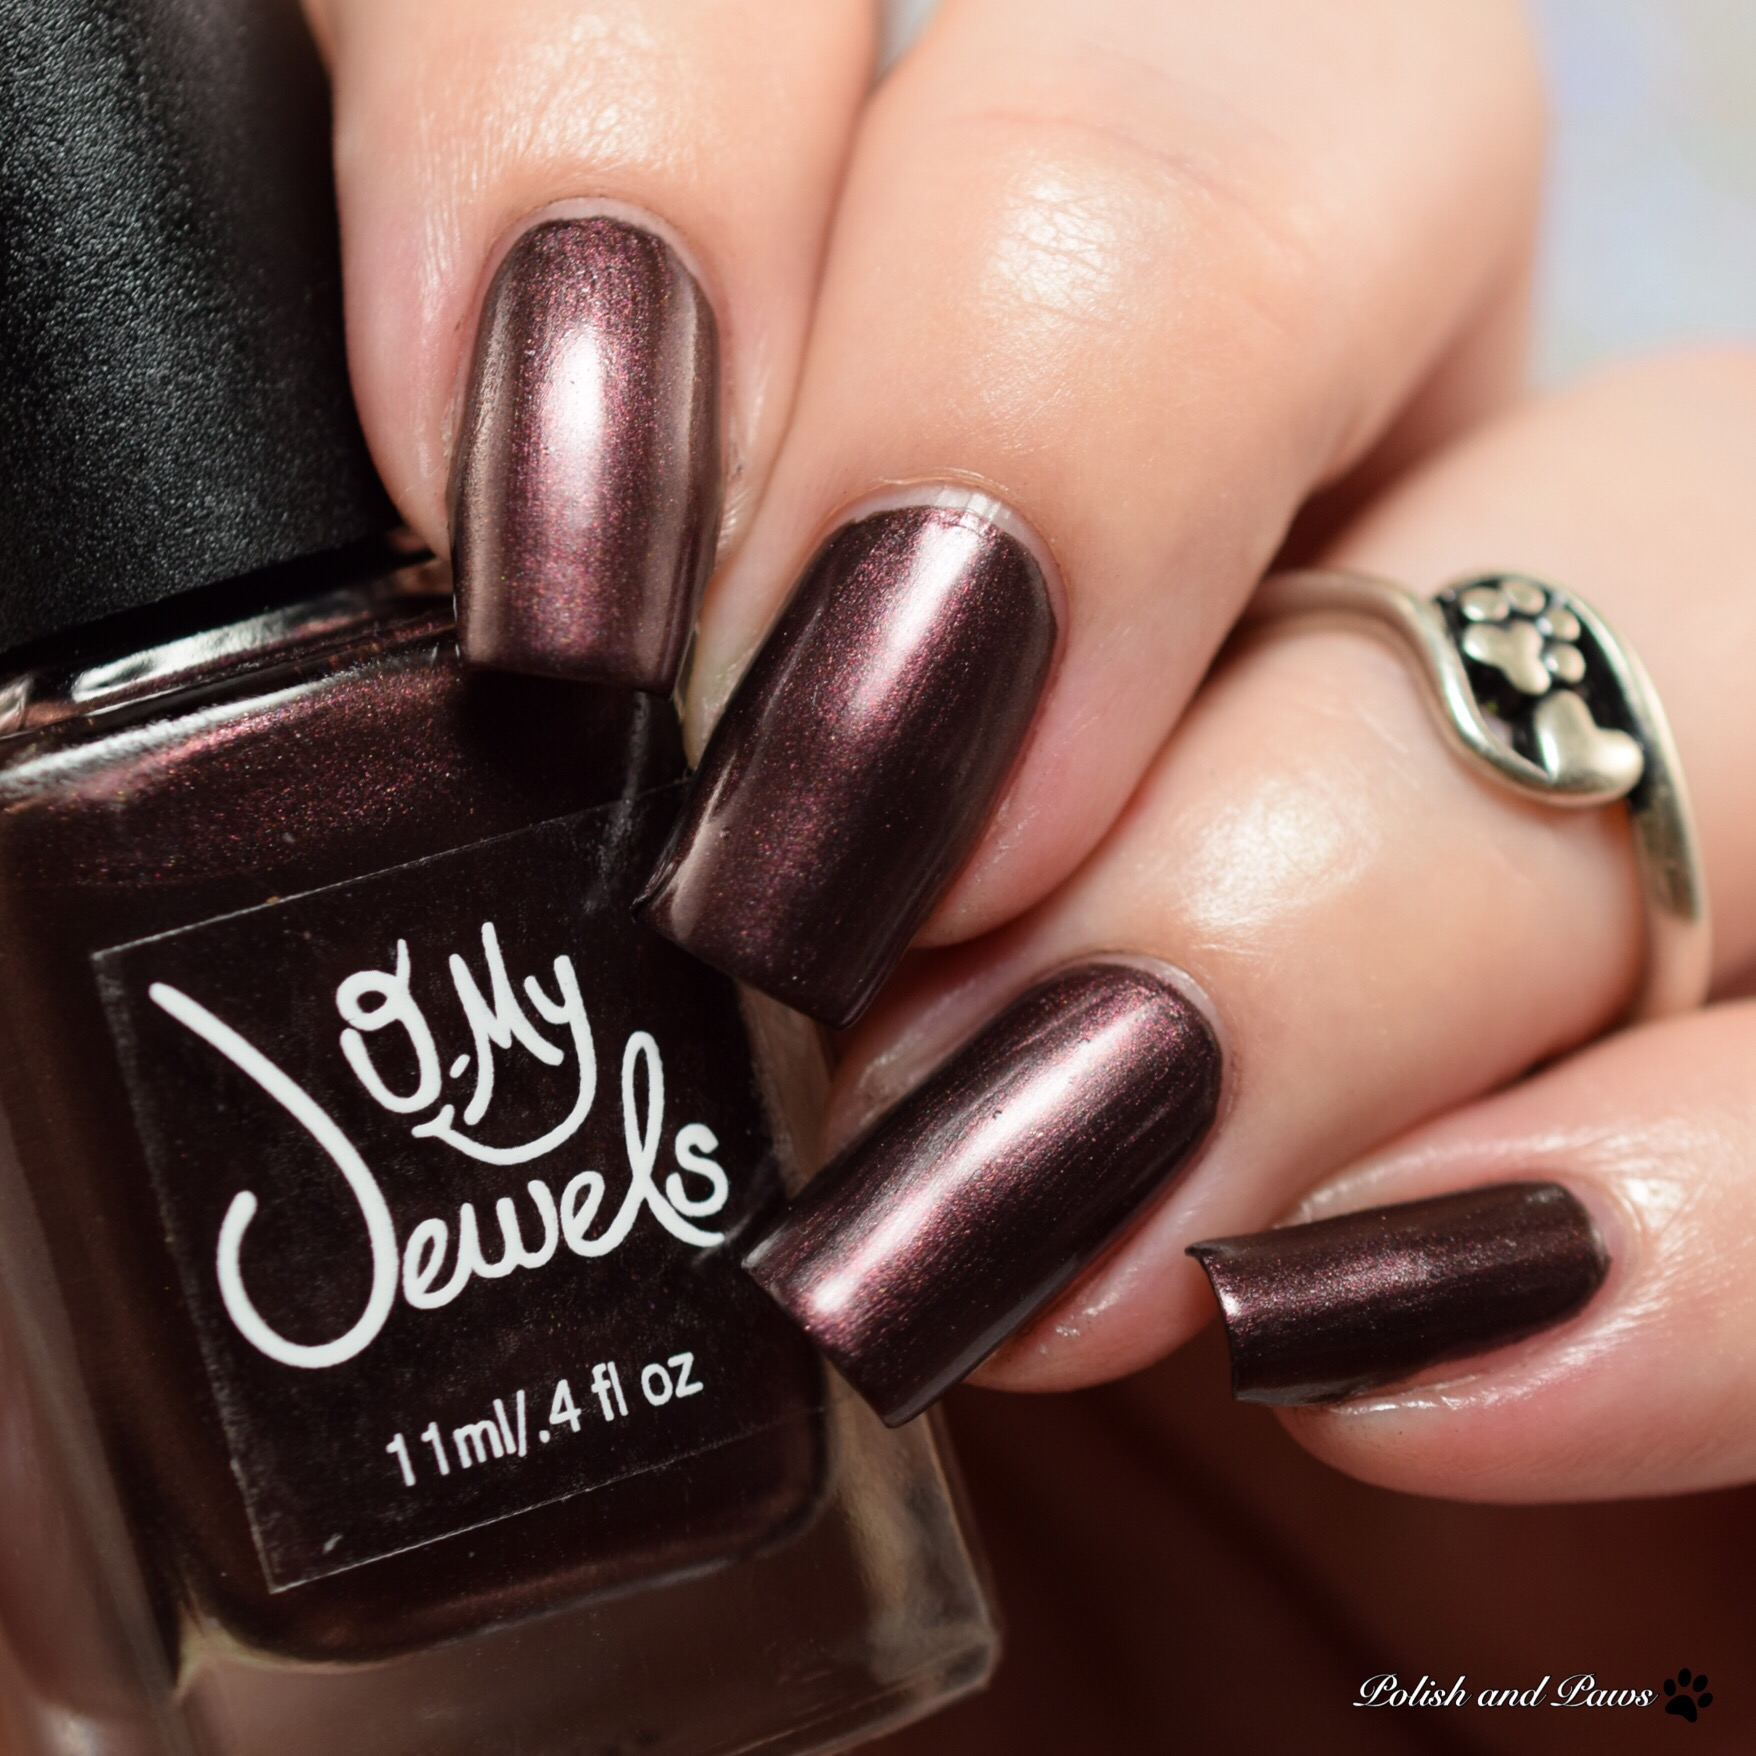 Oh My Jewels Black Cherry